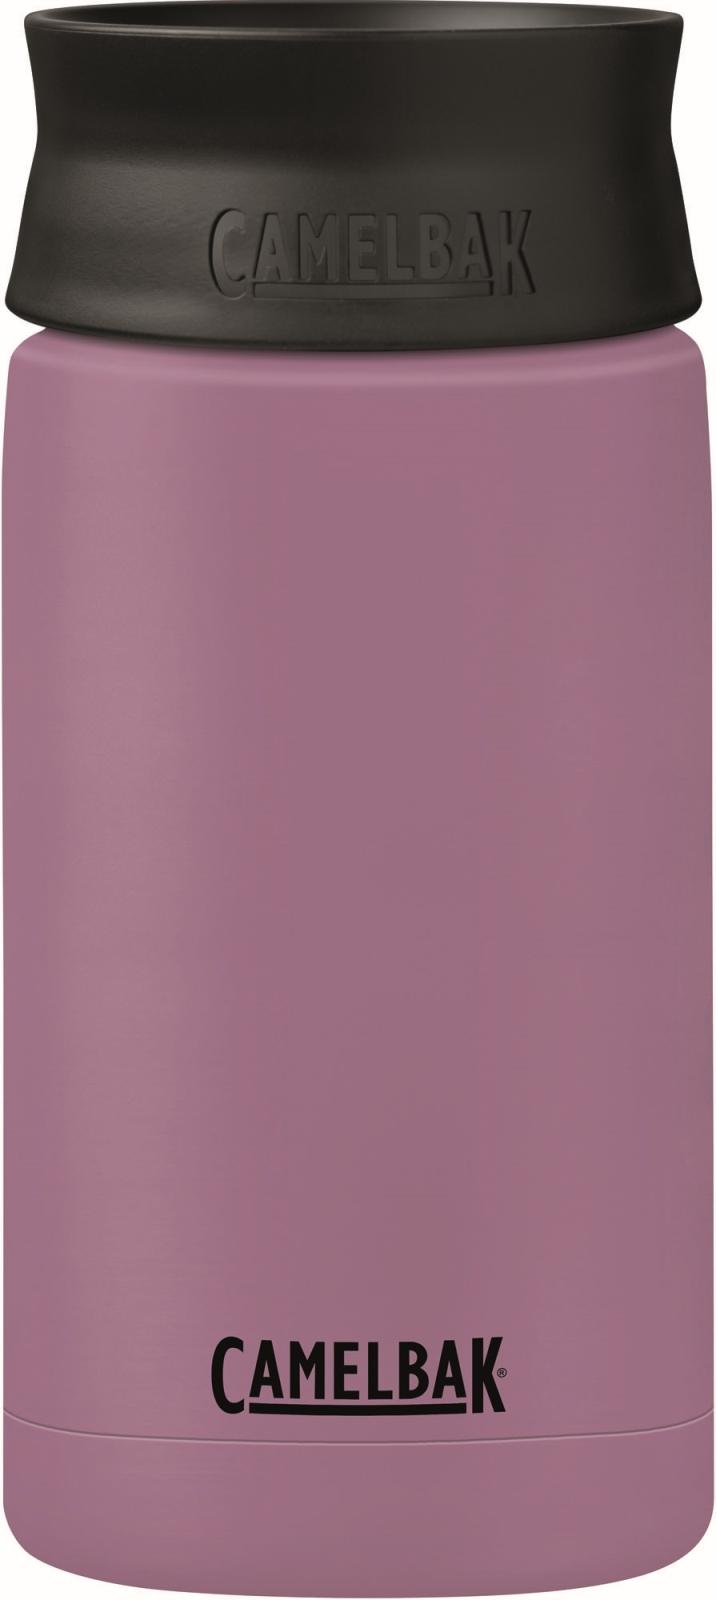 Camelbak Hot Cap Vacuum Stainless 0,4l - Light Purple uni